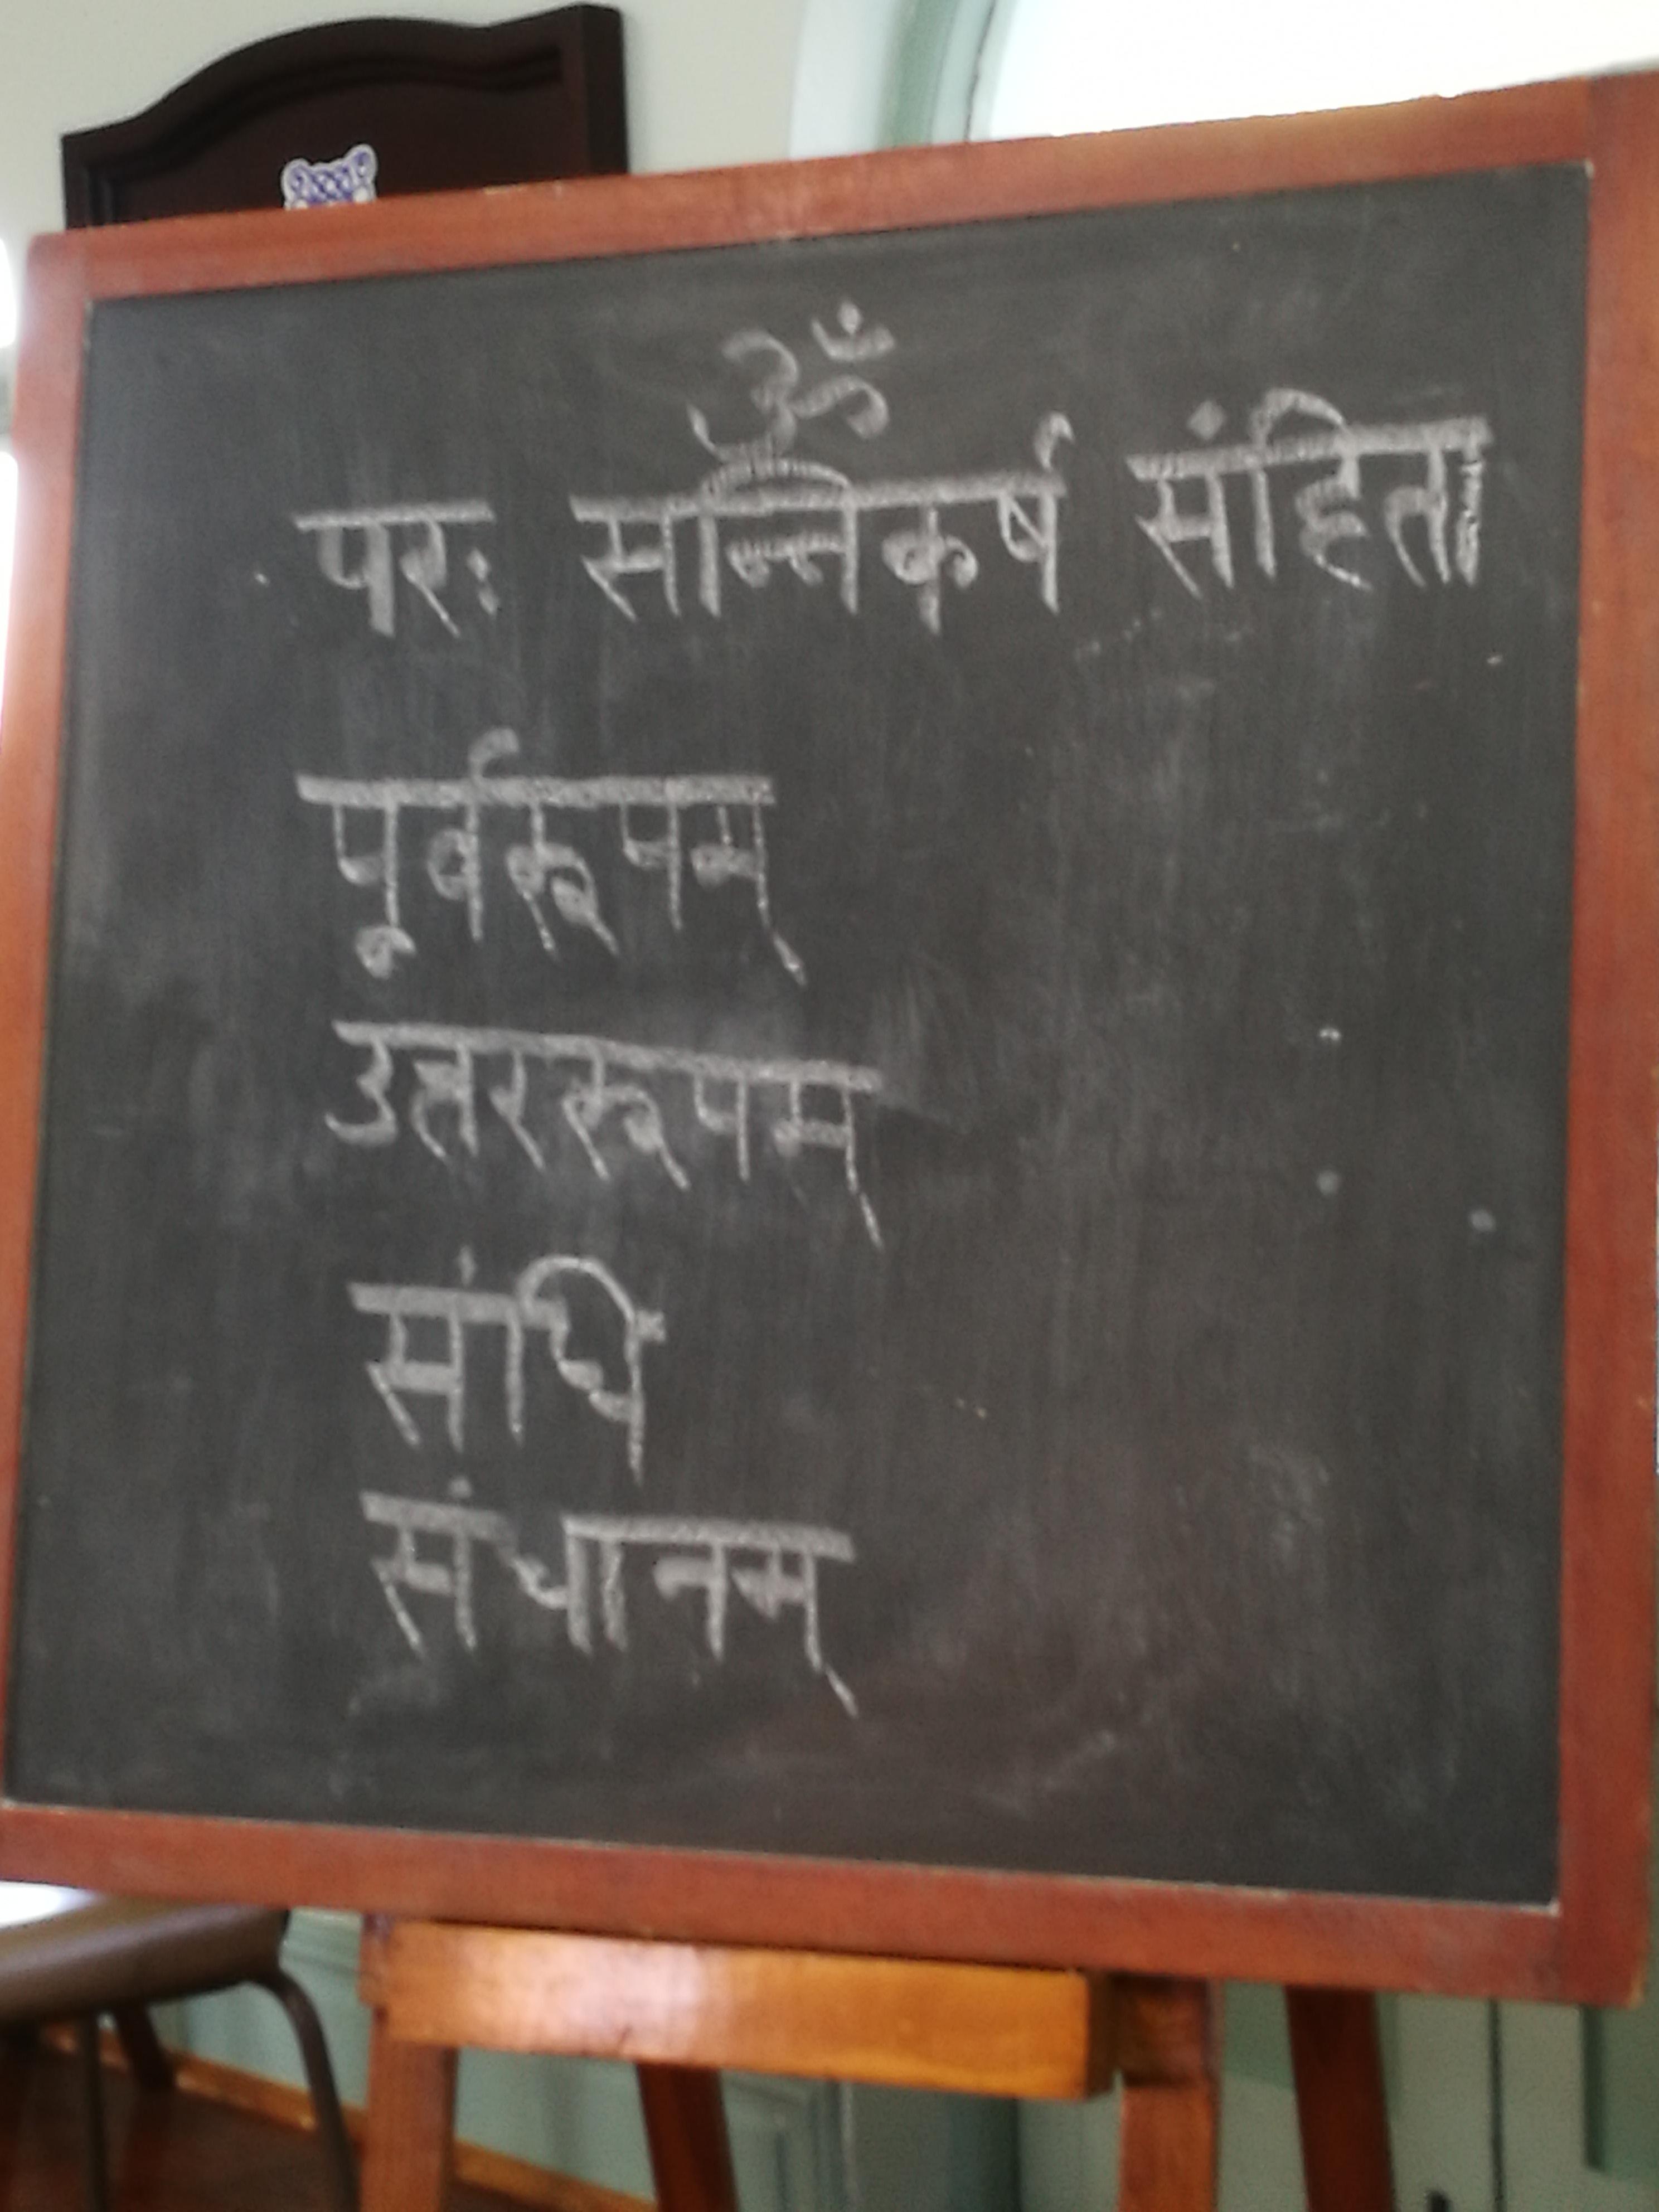 Students at the Durban School Enjoy Learning Sanskrit